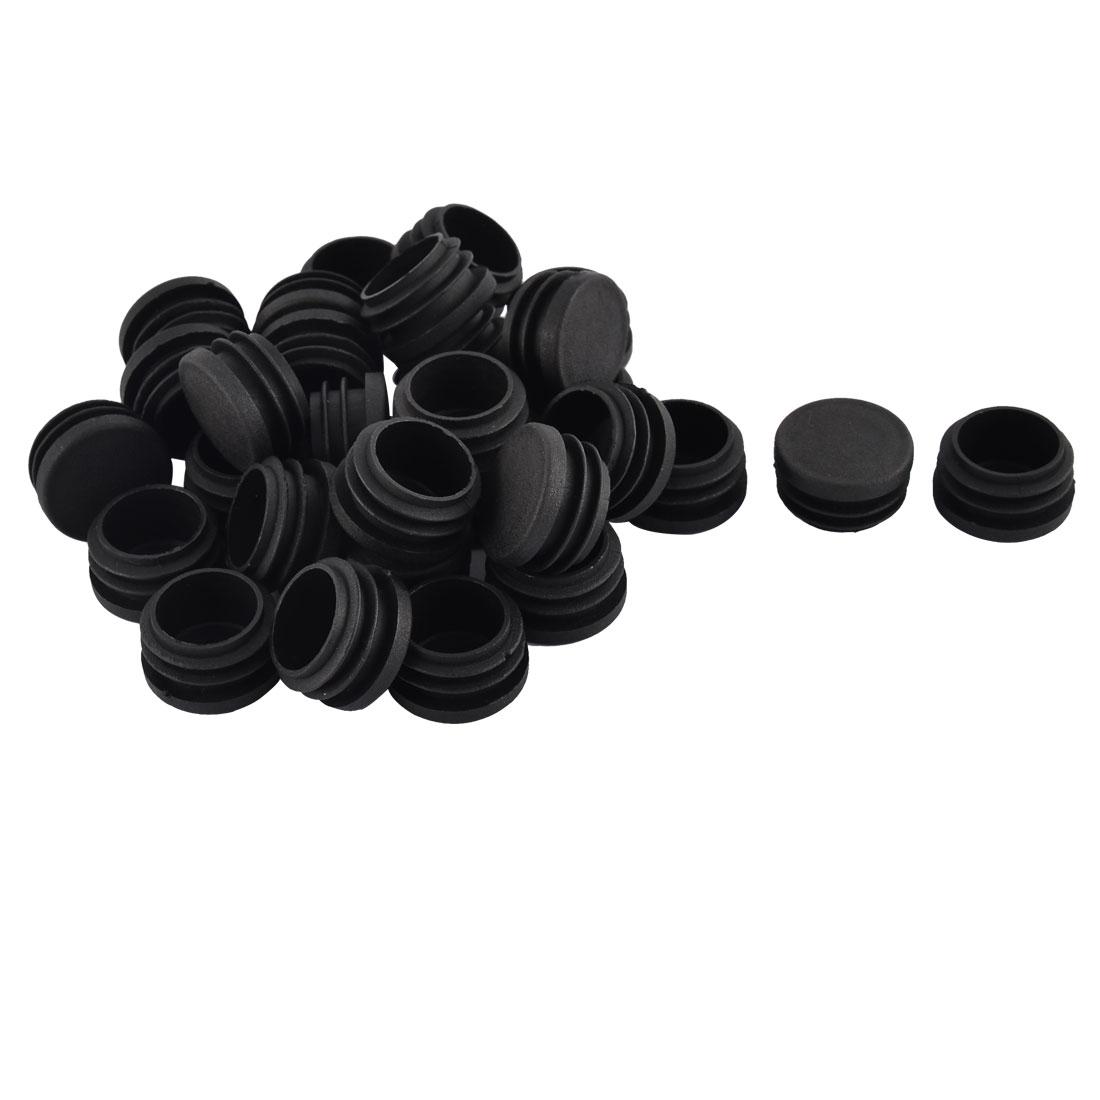 Table Chair Plastic Round Tube Insert Tubing Cap Pipe Cover Black 40mm Dia 40pcs